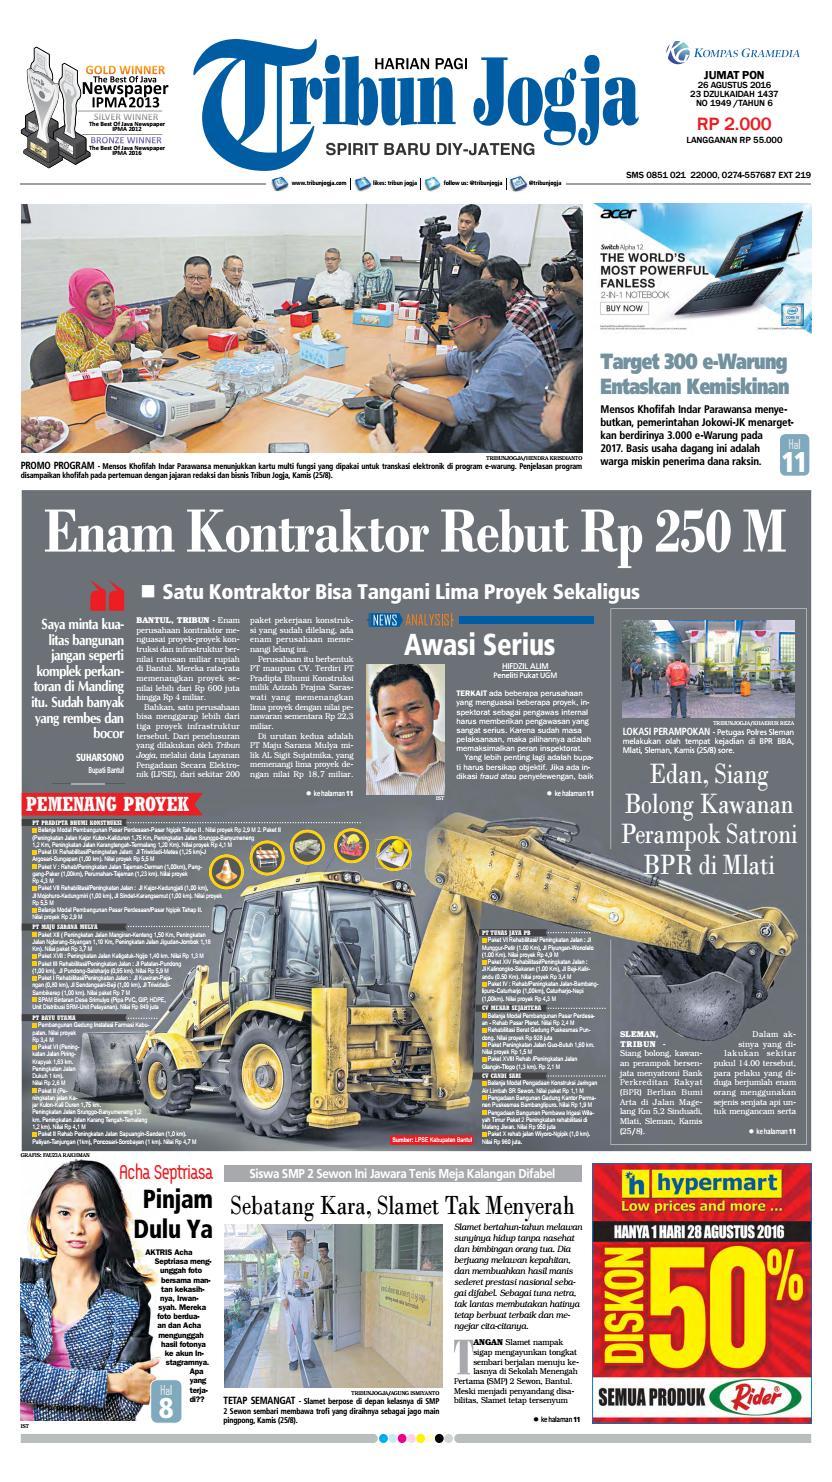 Tribunjogja 26 08 2016 By Tribun Jogja Issuu Produk Ukm Bumn Jus Durian Lite Kuning Omah Duren